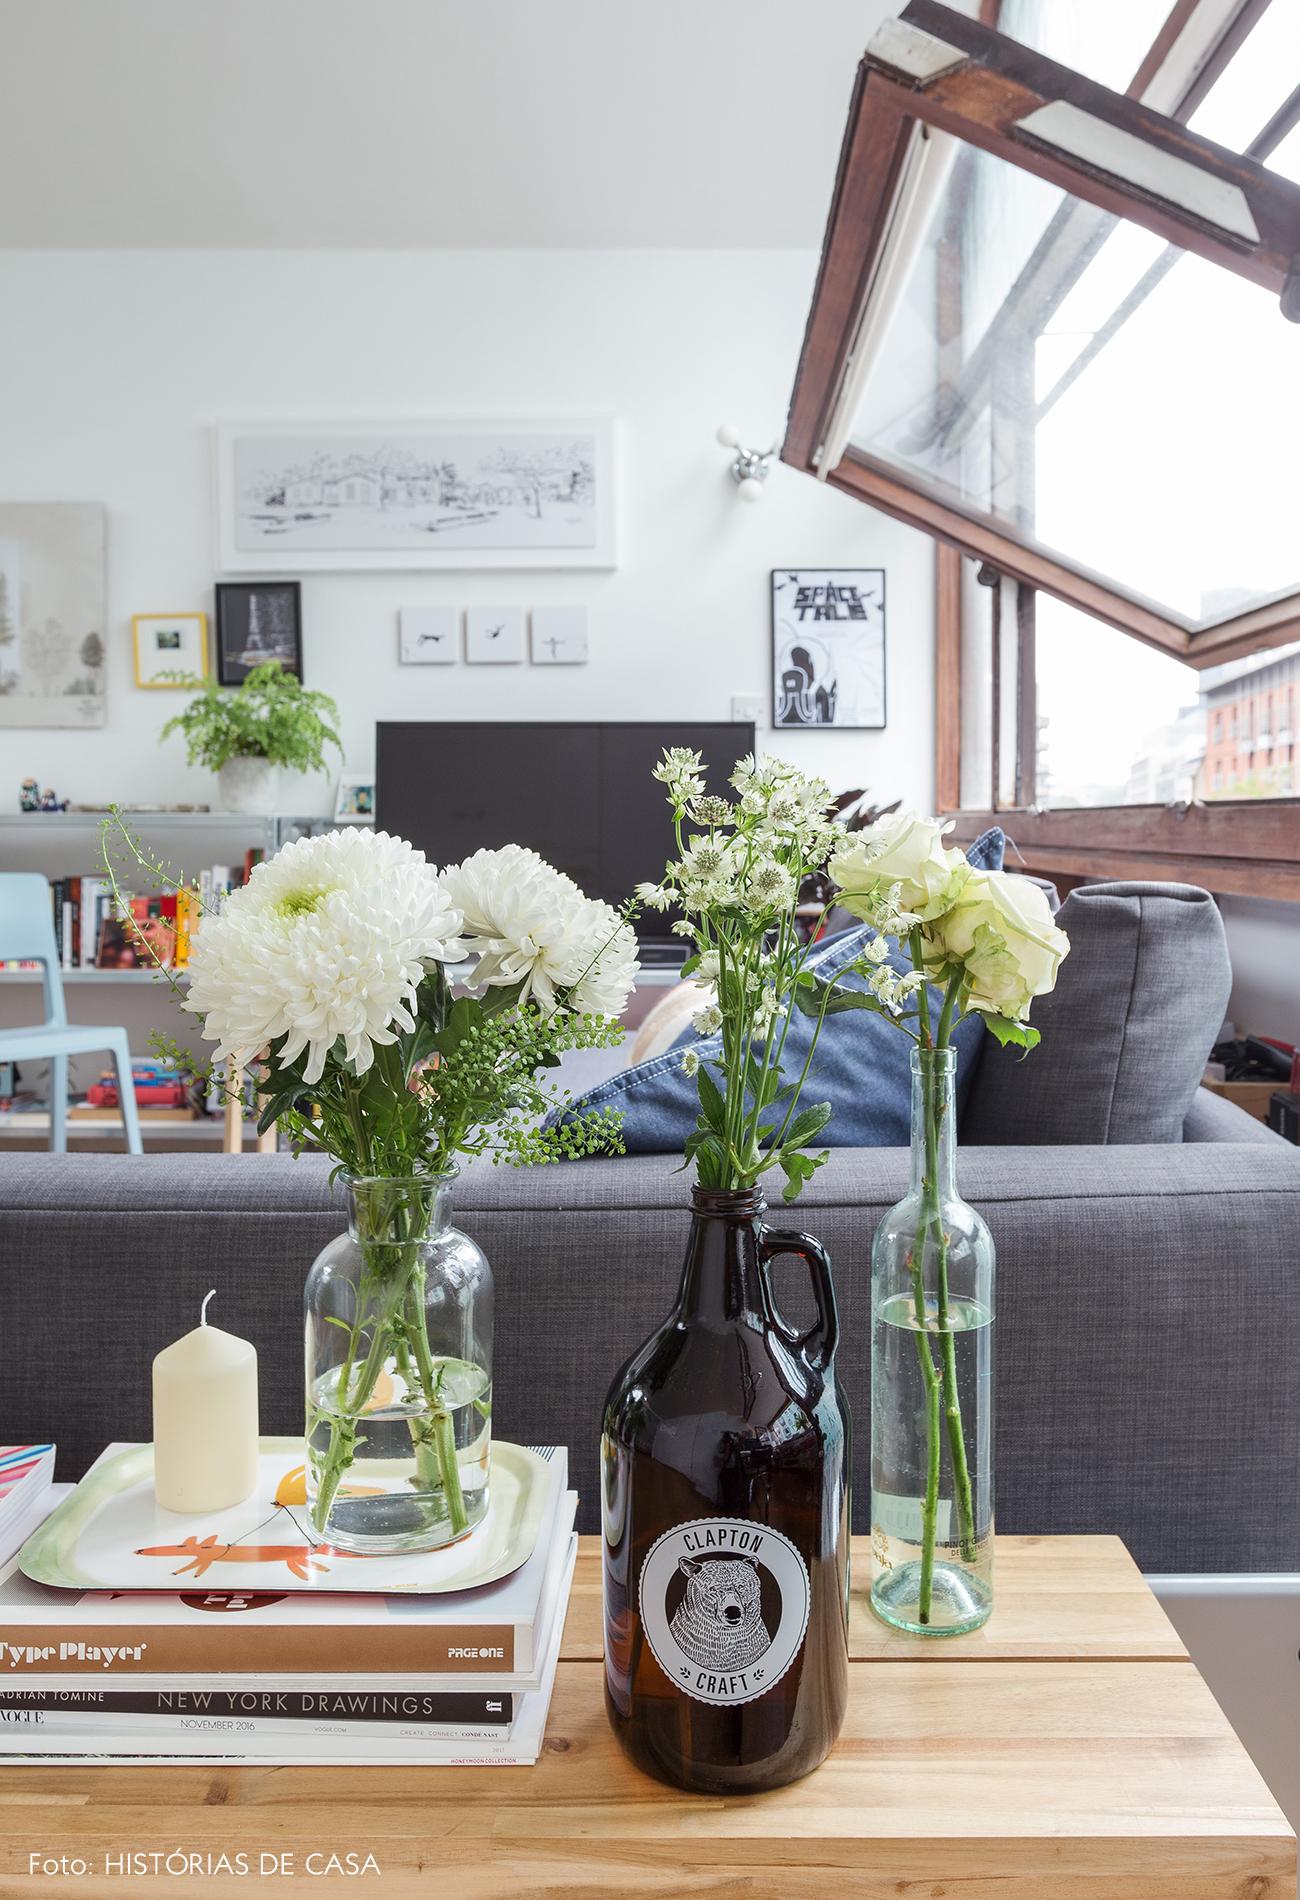 12-decoracao-apartamento-pequeno-detalhes-garrafas-como-vasos